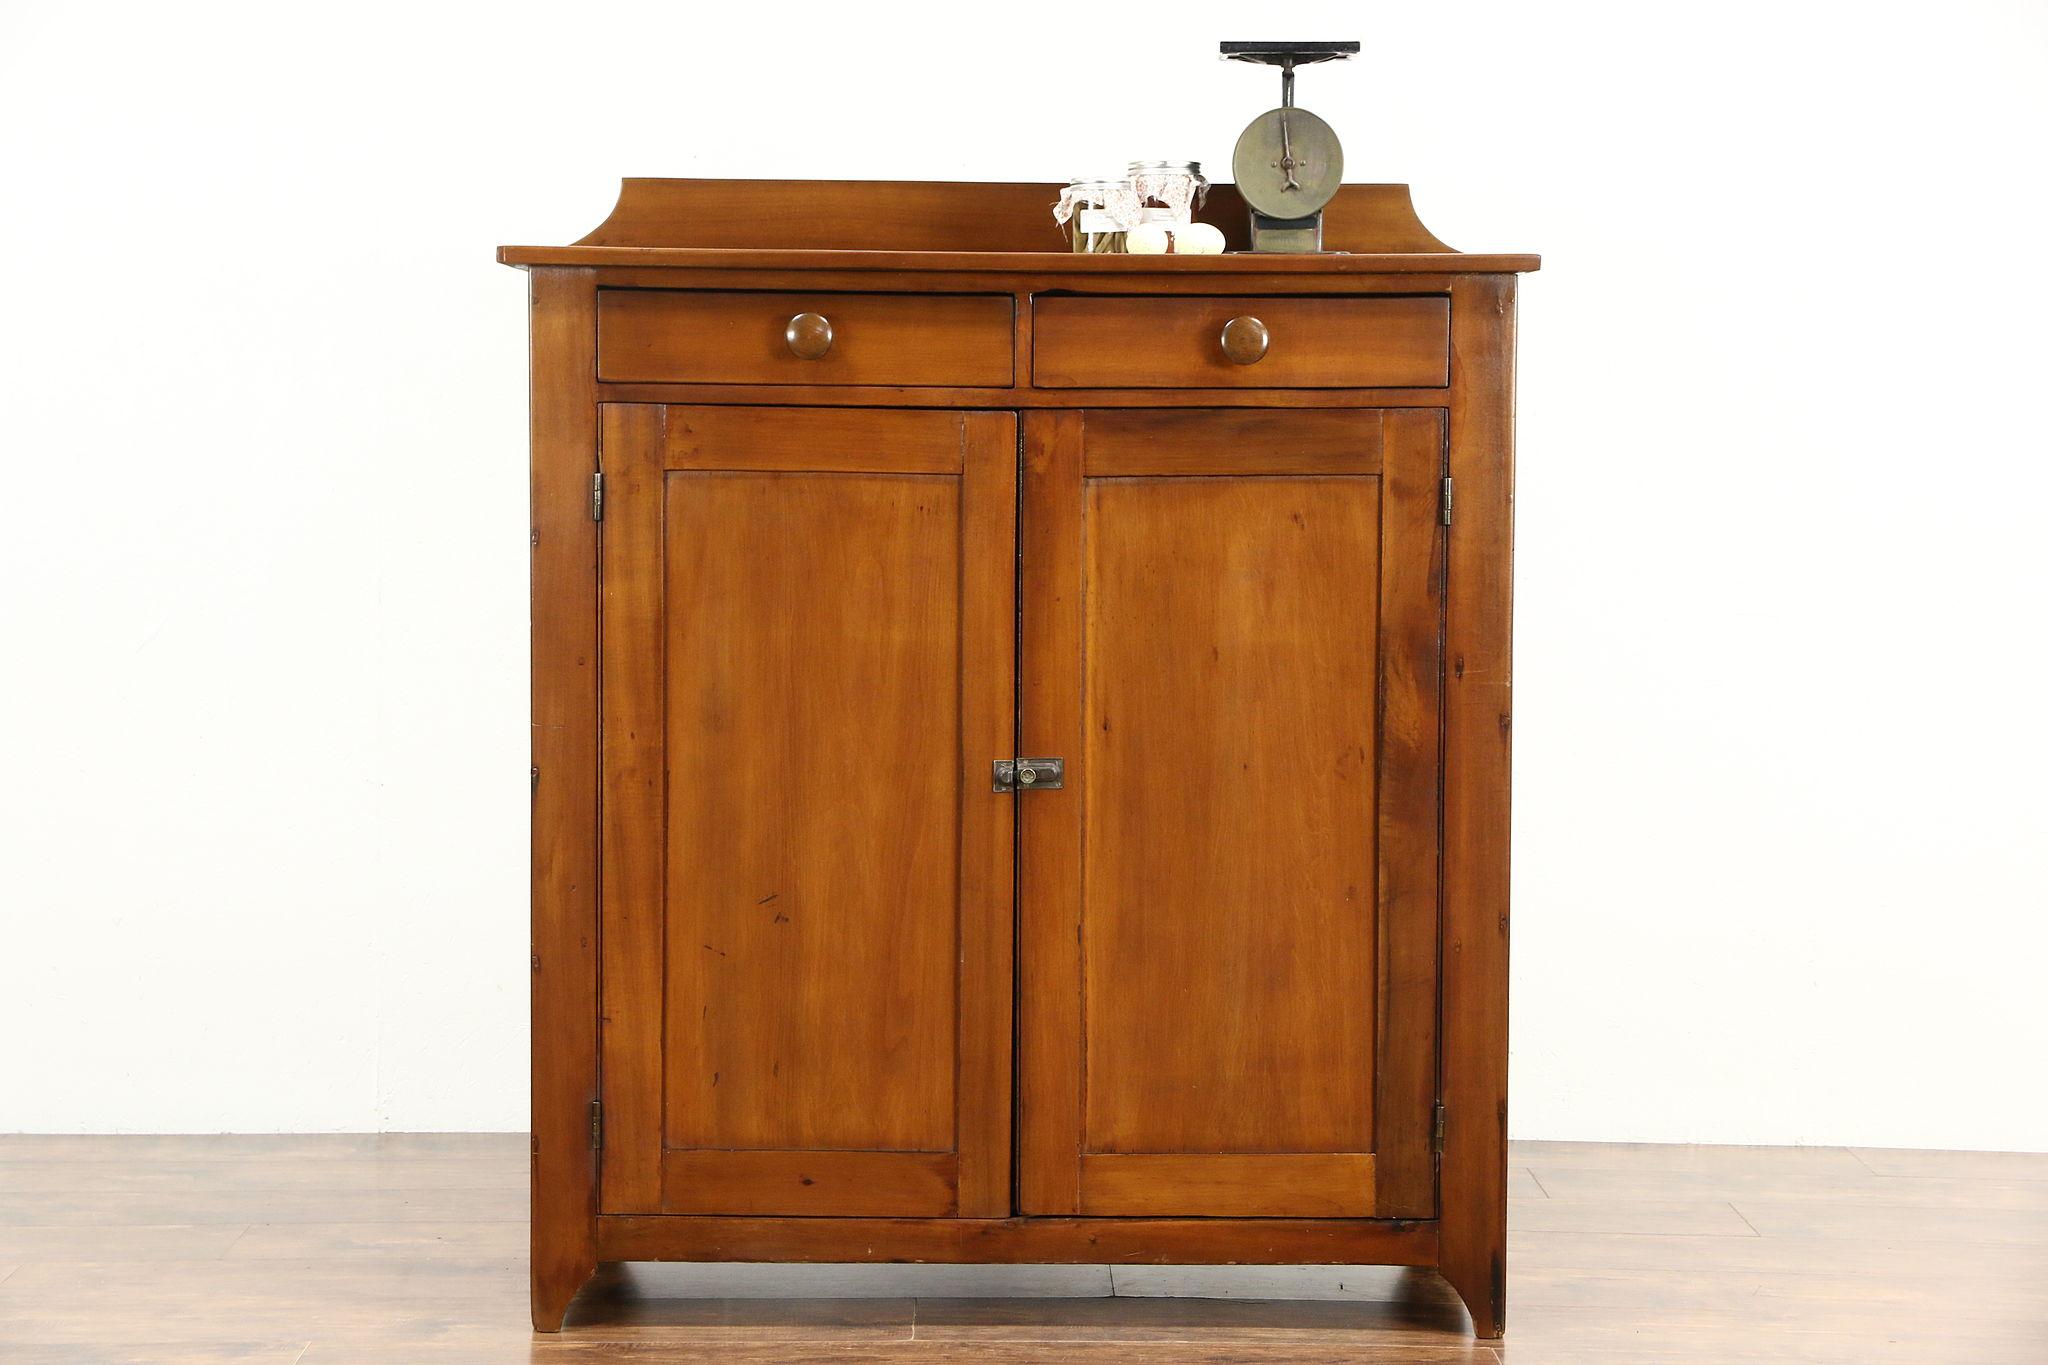 Sold Pantry Cabinet Antique Pennsylvania 1850 Farmhouse